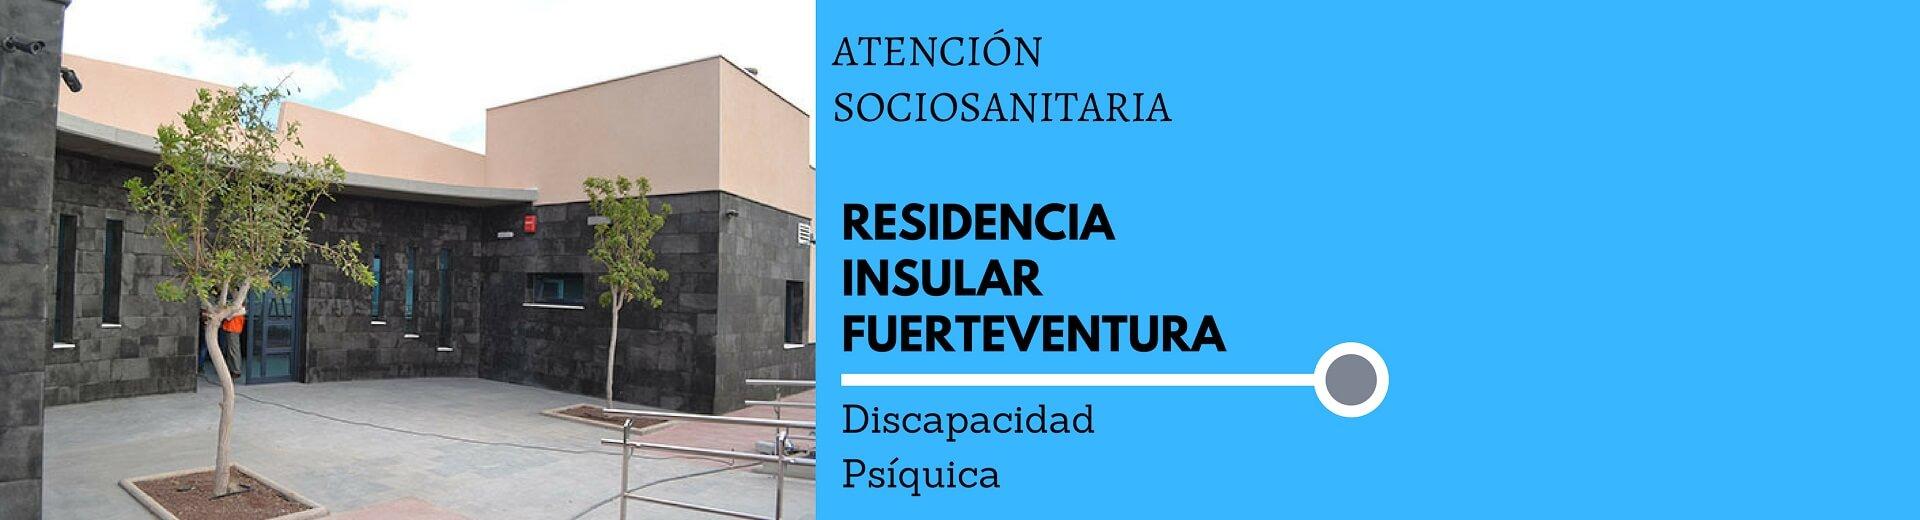 ISCAN_Residenciainsularfuerteventura